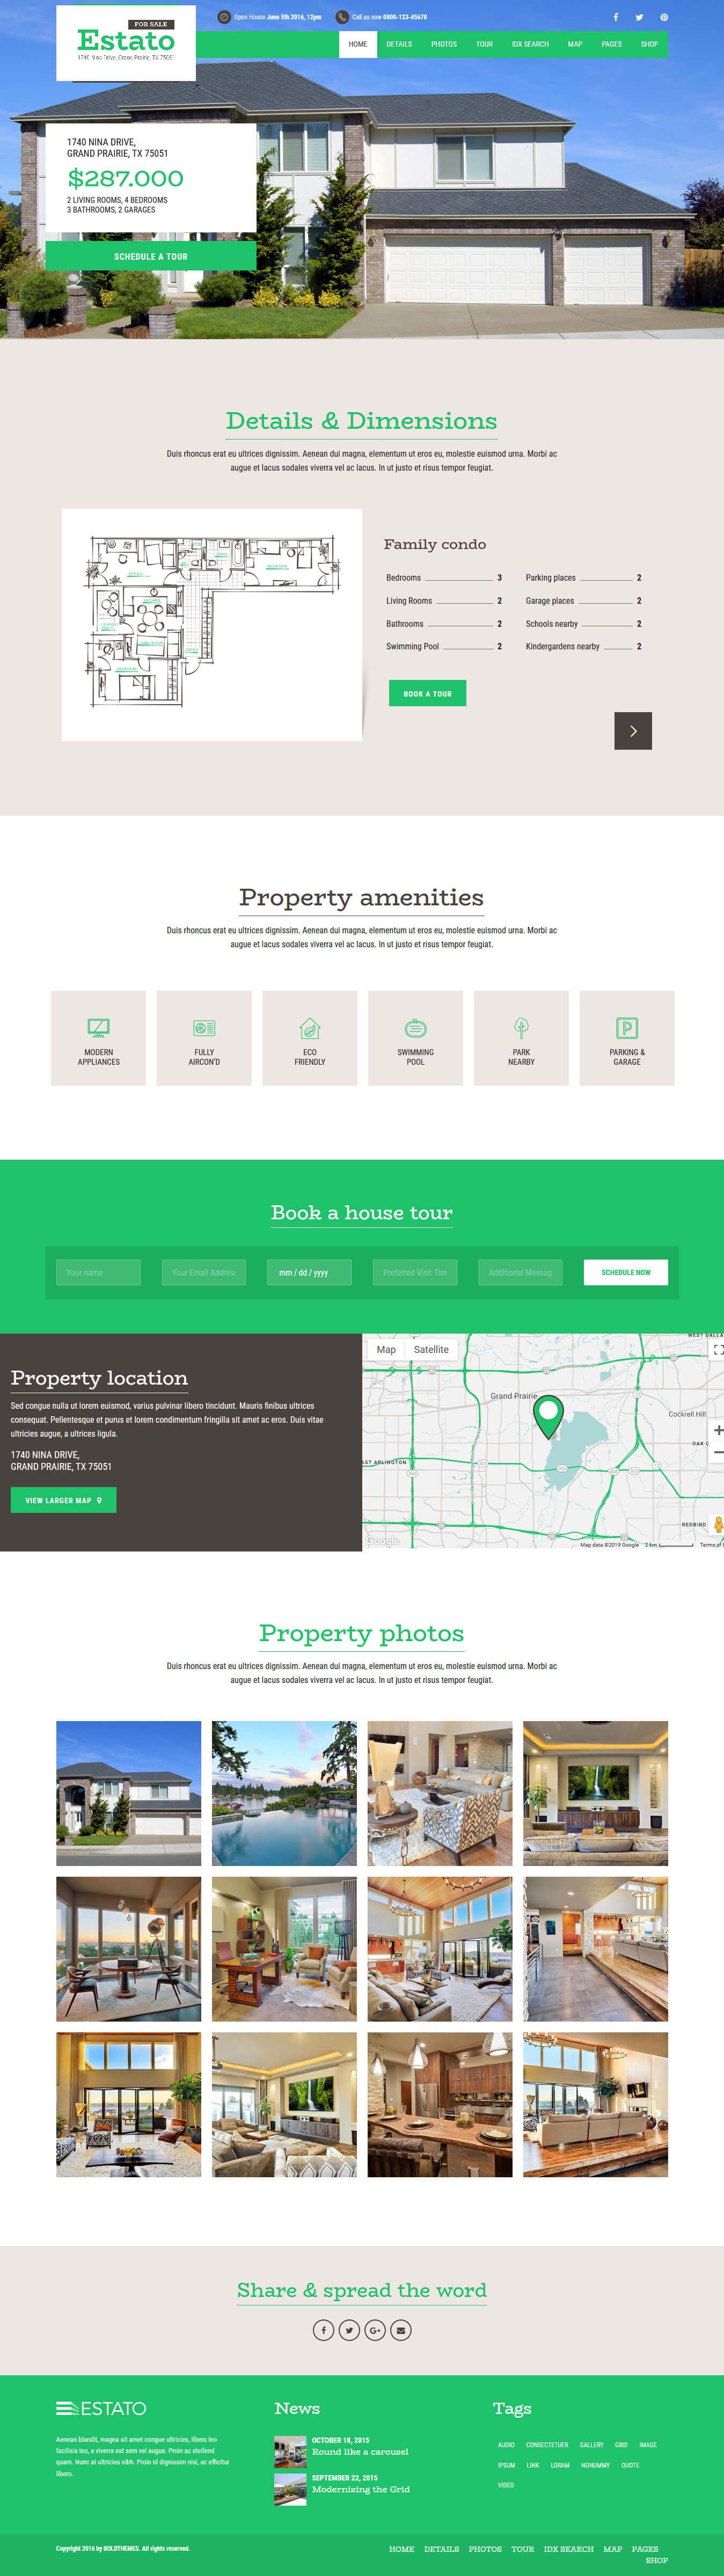 estato best premium home rental property wordpress theme - 10+ Best Premium Home Rental and Property WordPress Themes